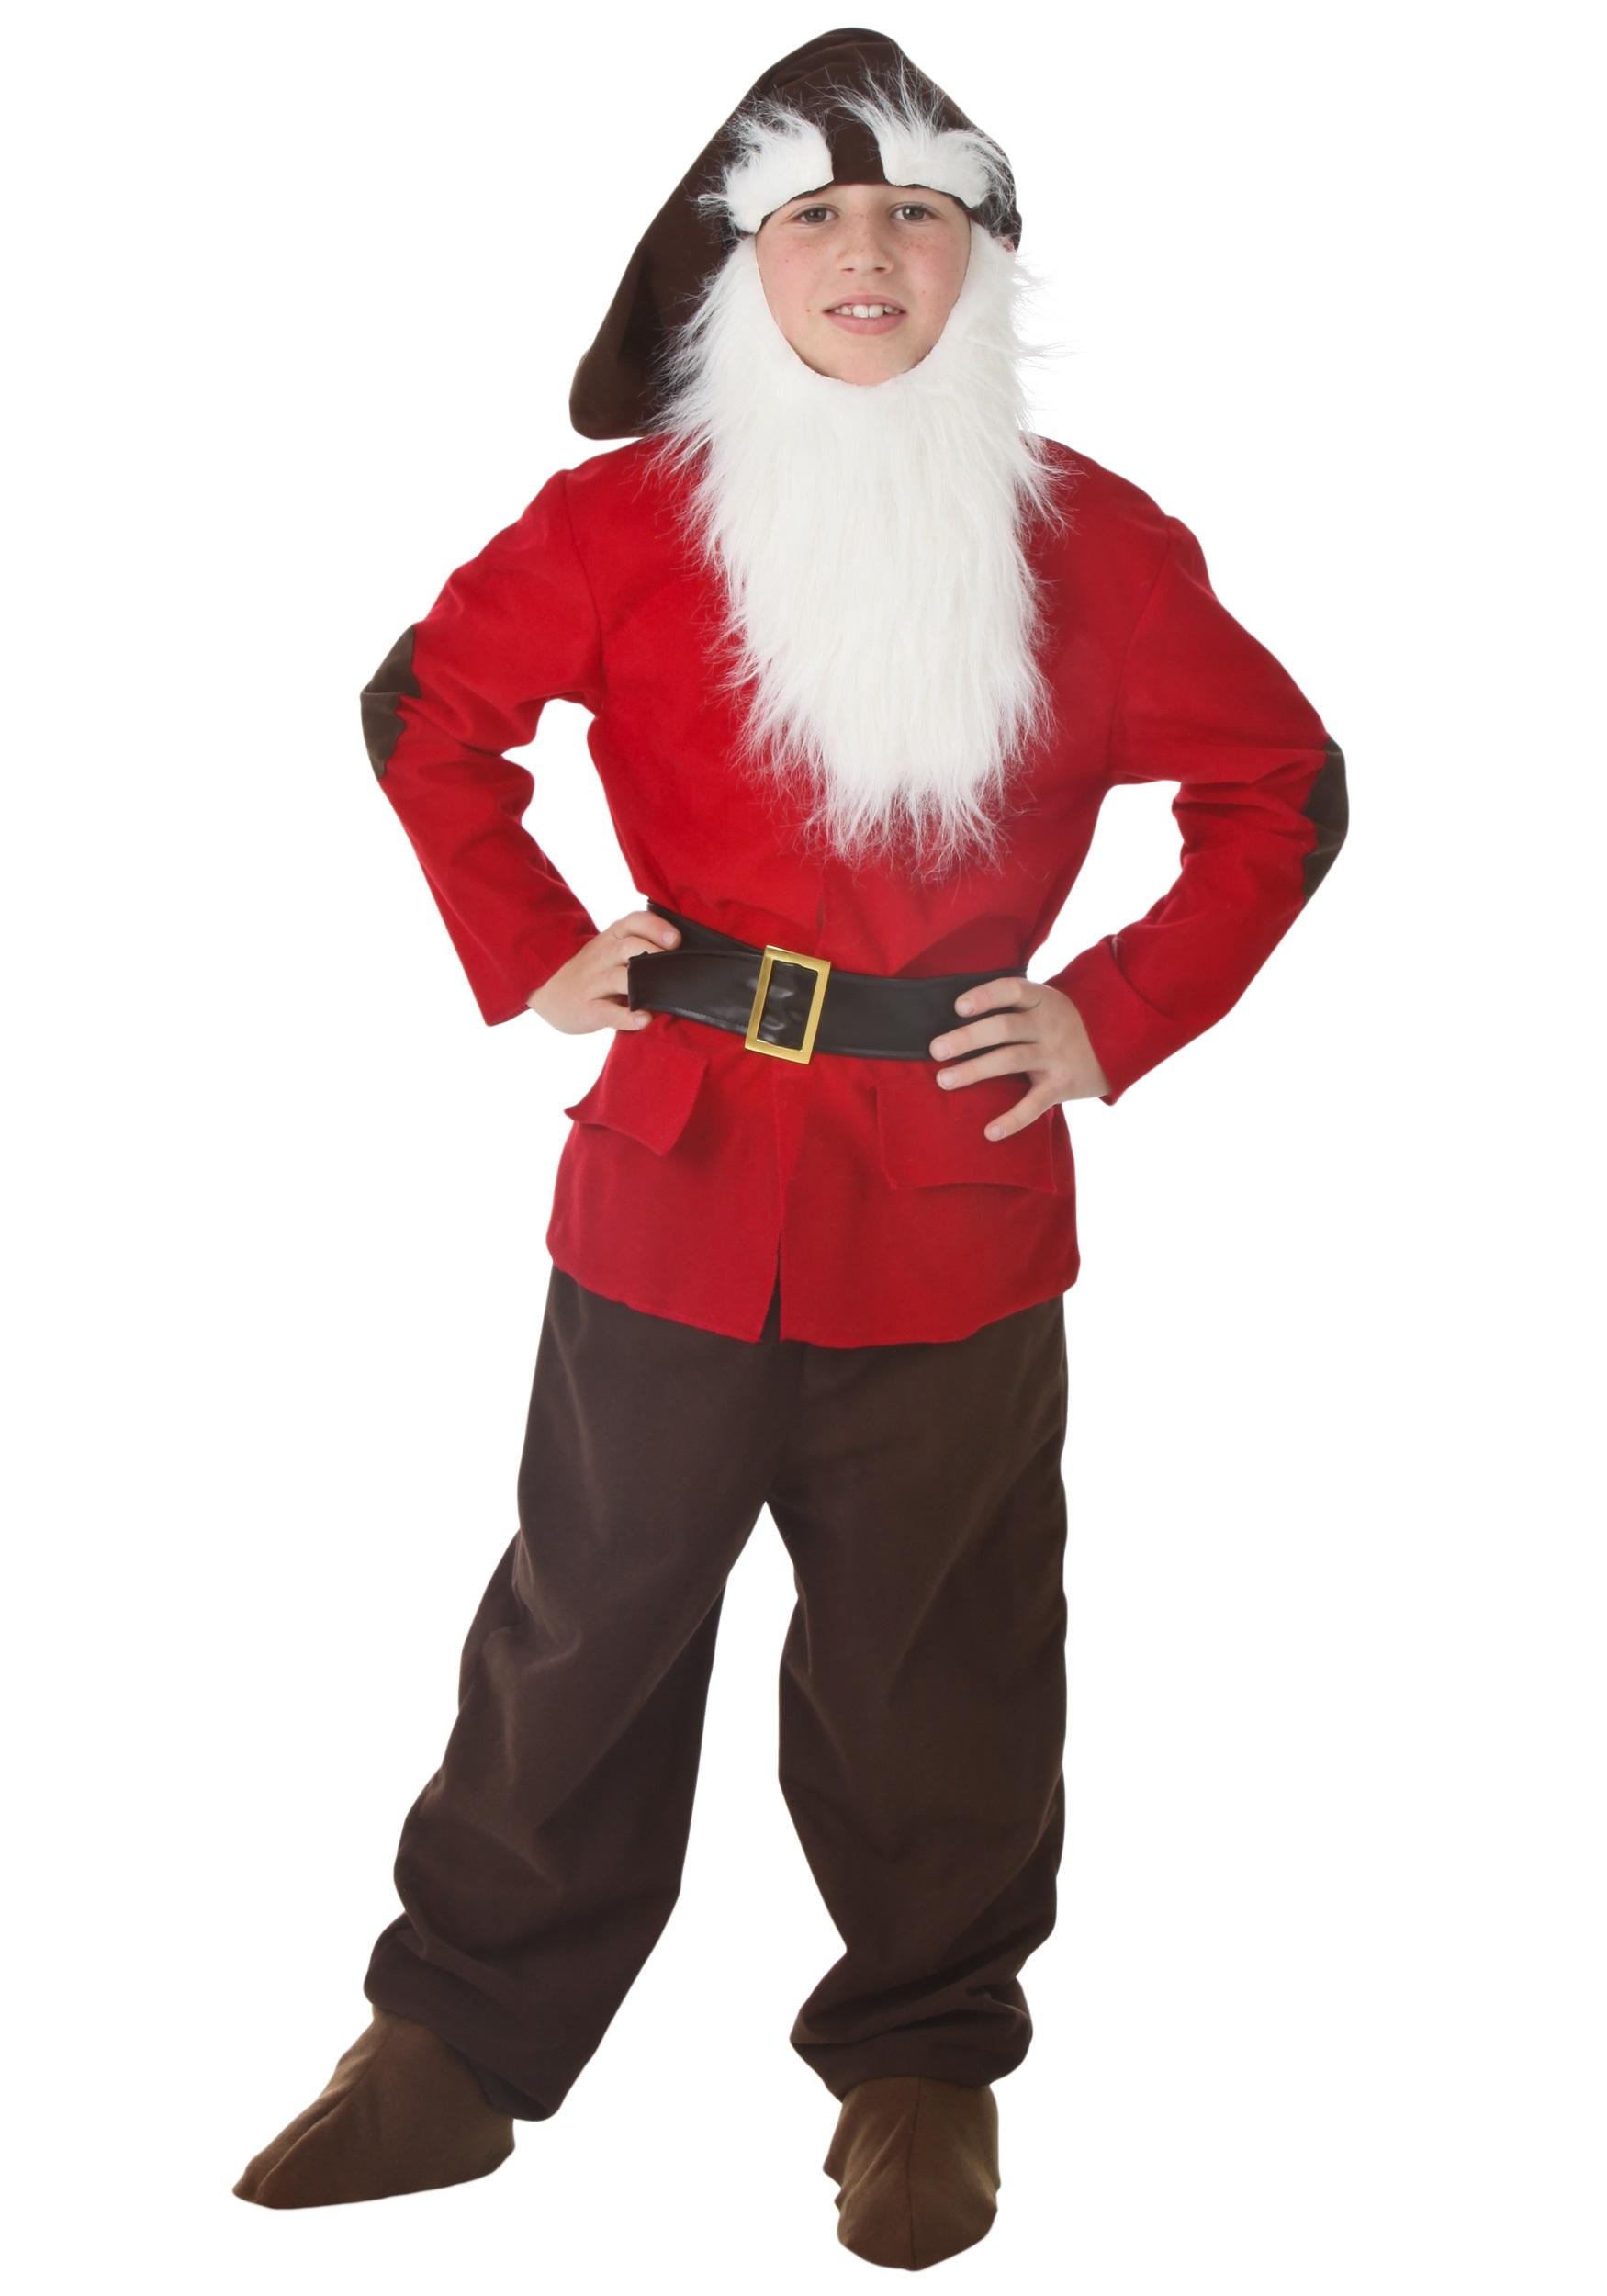 sleepy dwarf costume ideas